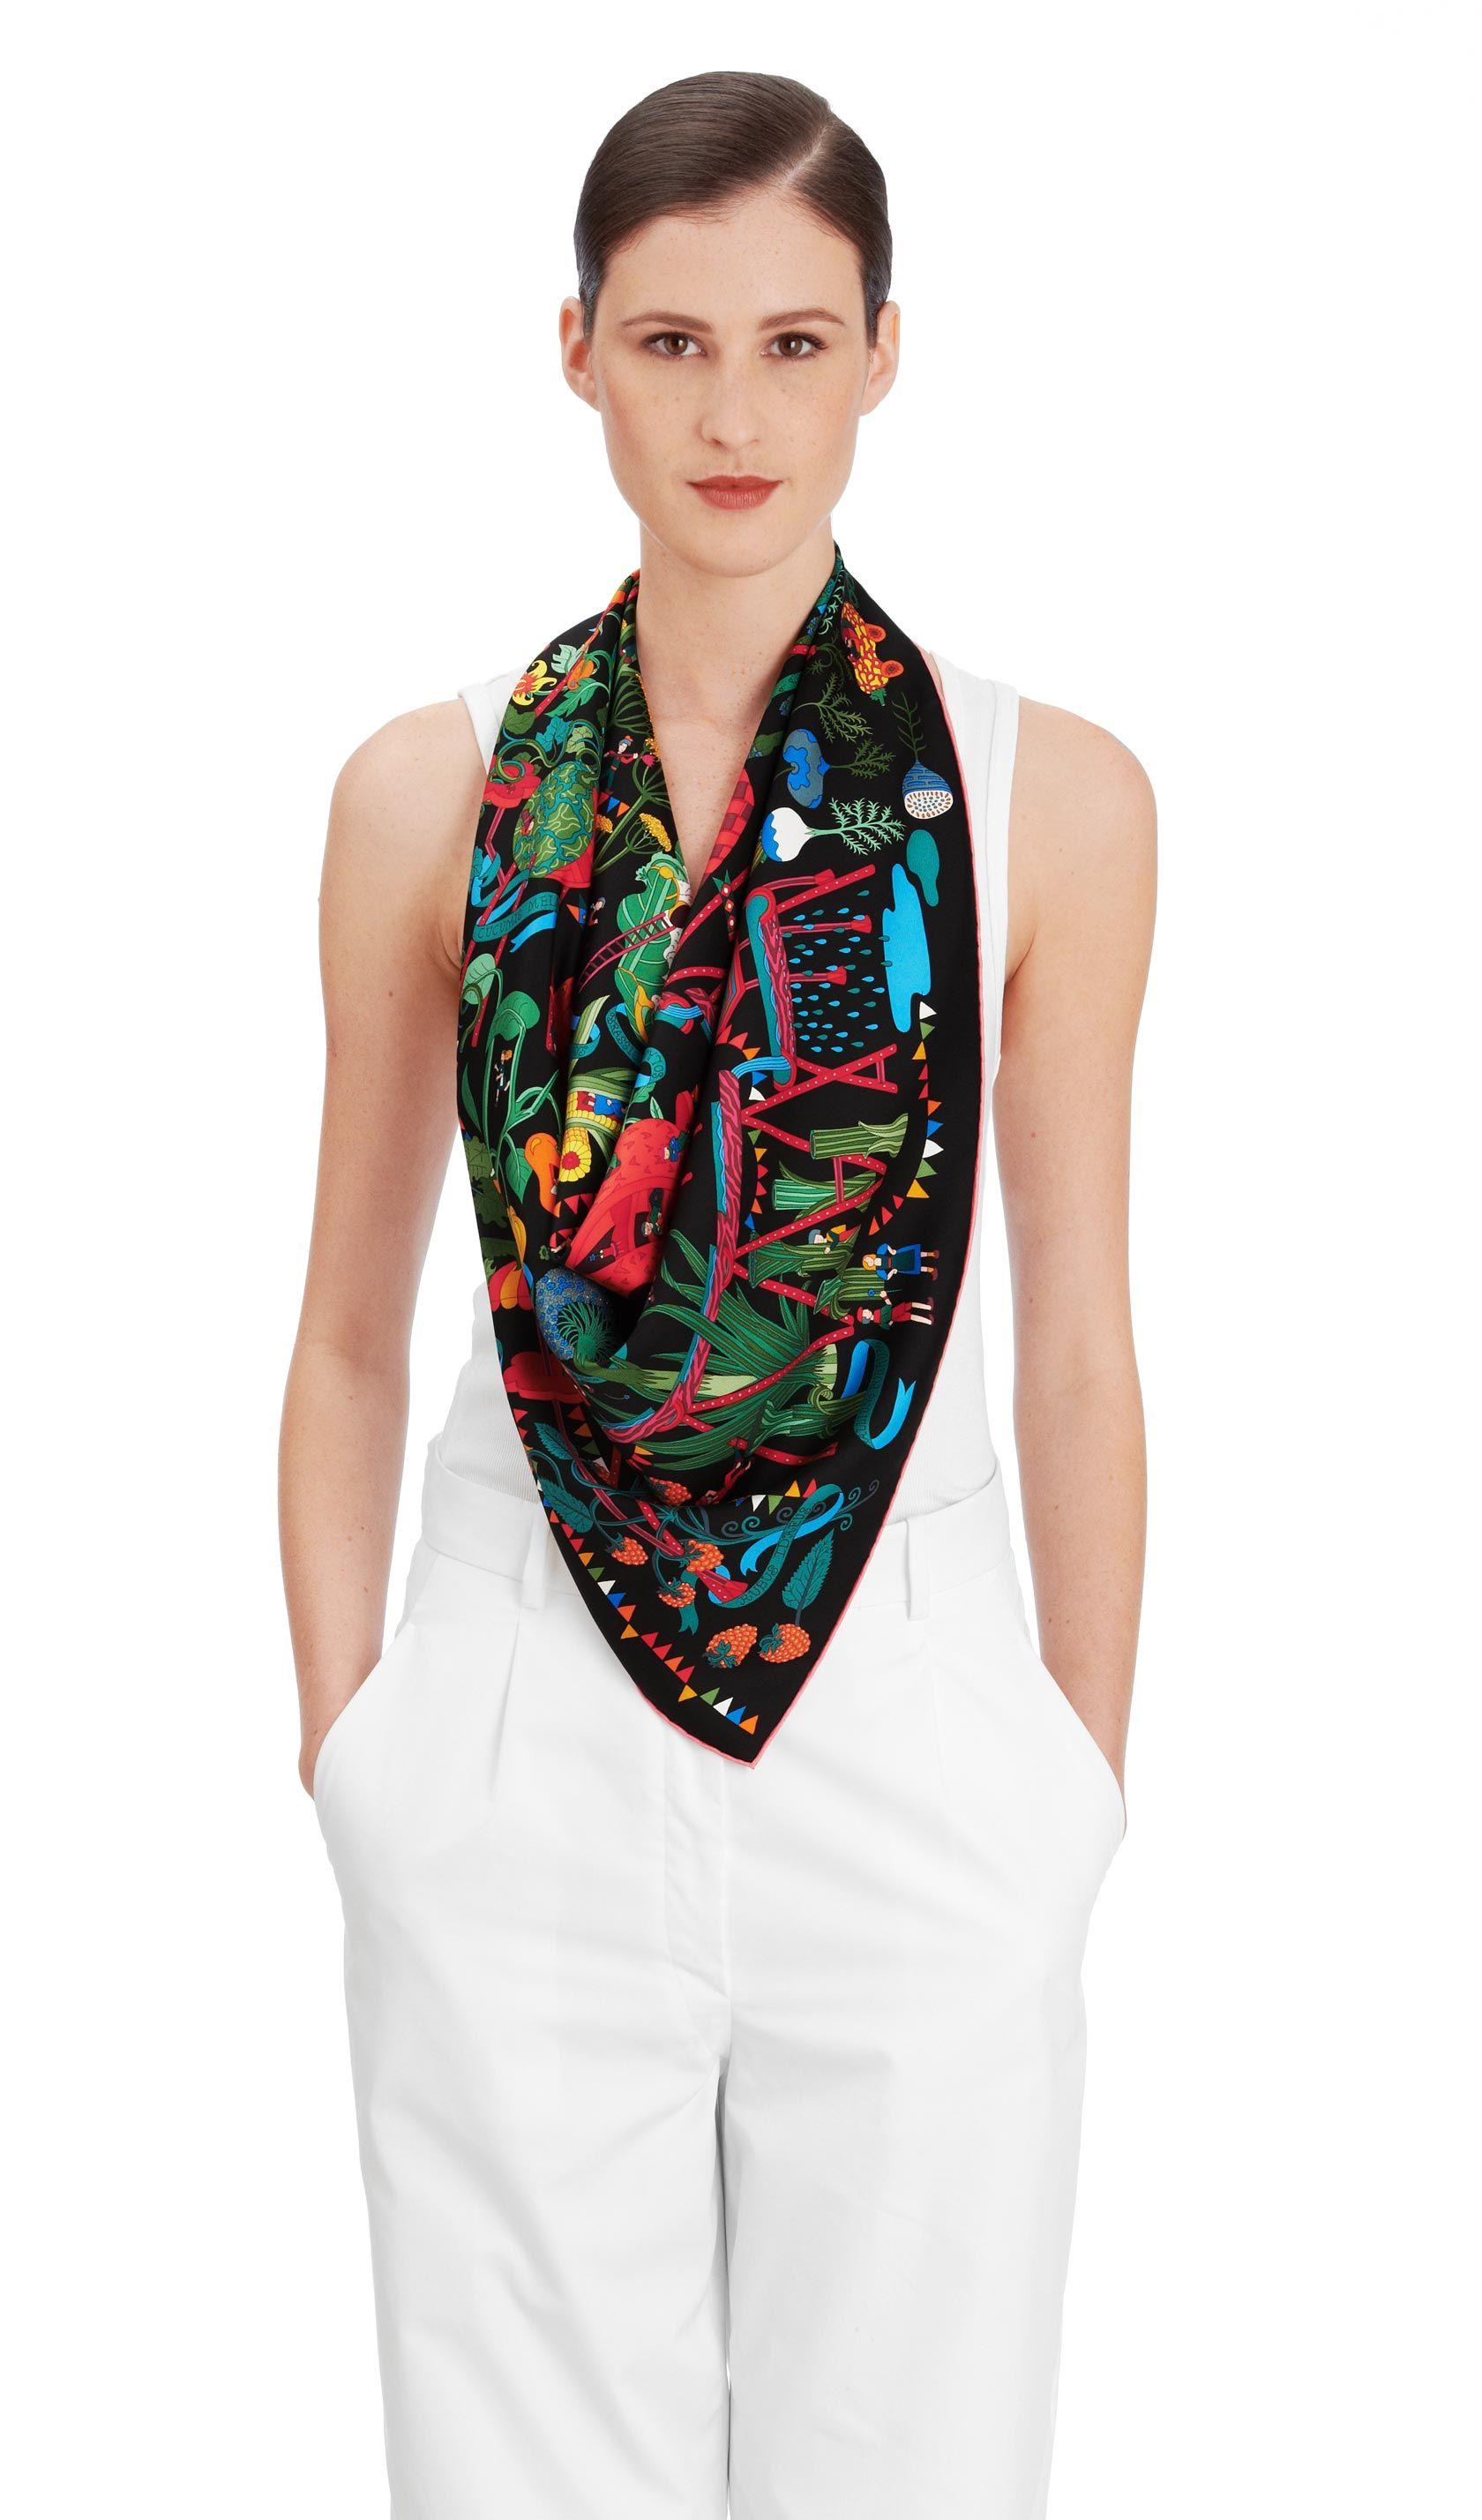 Cashmere Silk Scarf - Day Lily by VIDA VIDA 8FZg6VtB